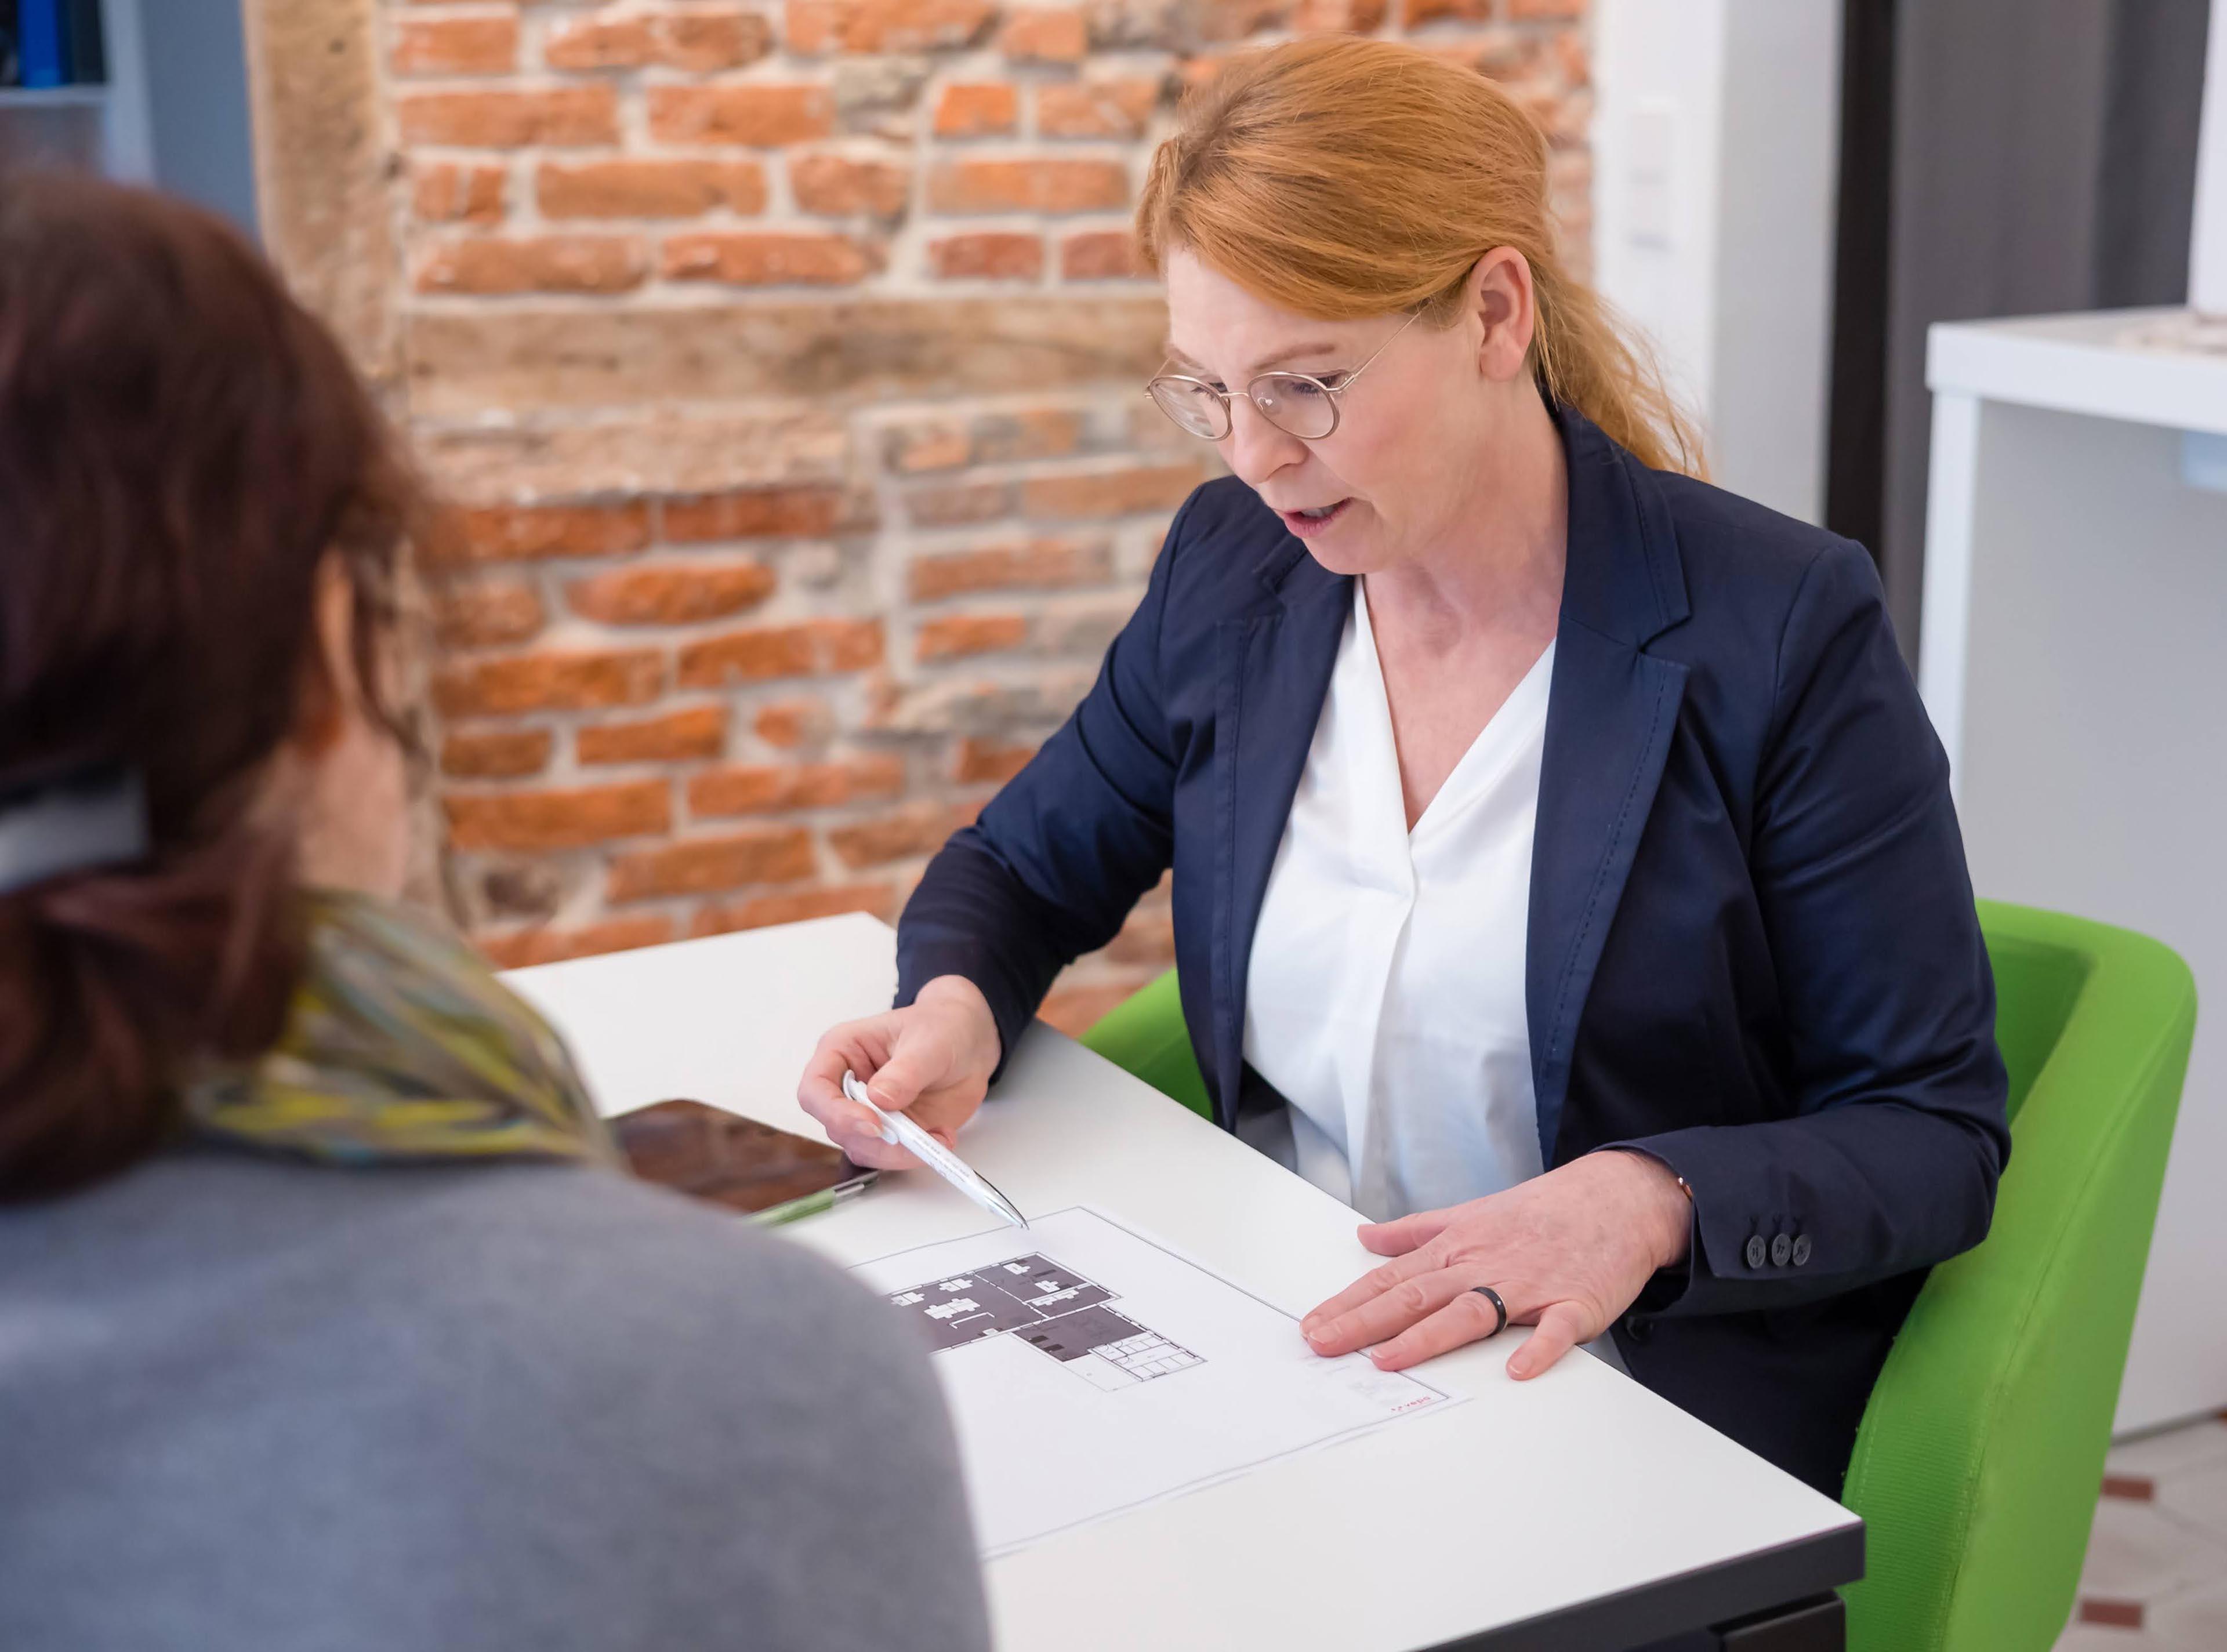 wermke bürokonzepte | Katrin Wermke in der Beratung